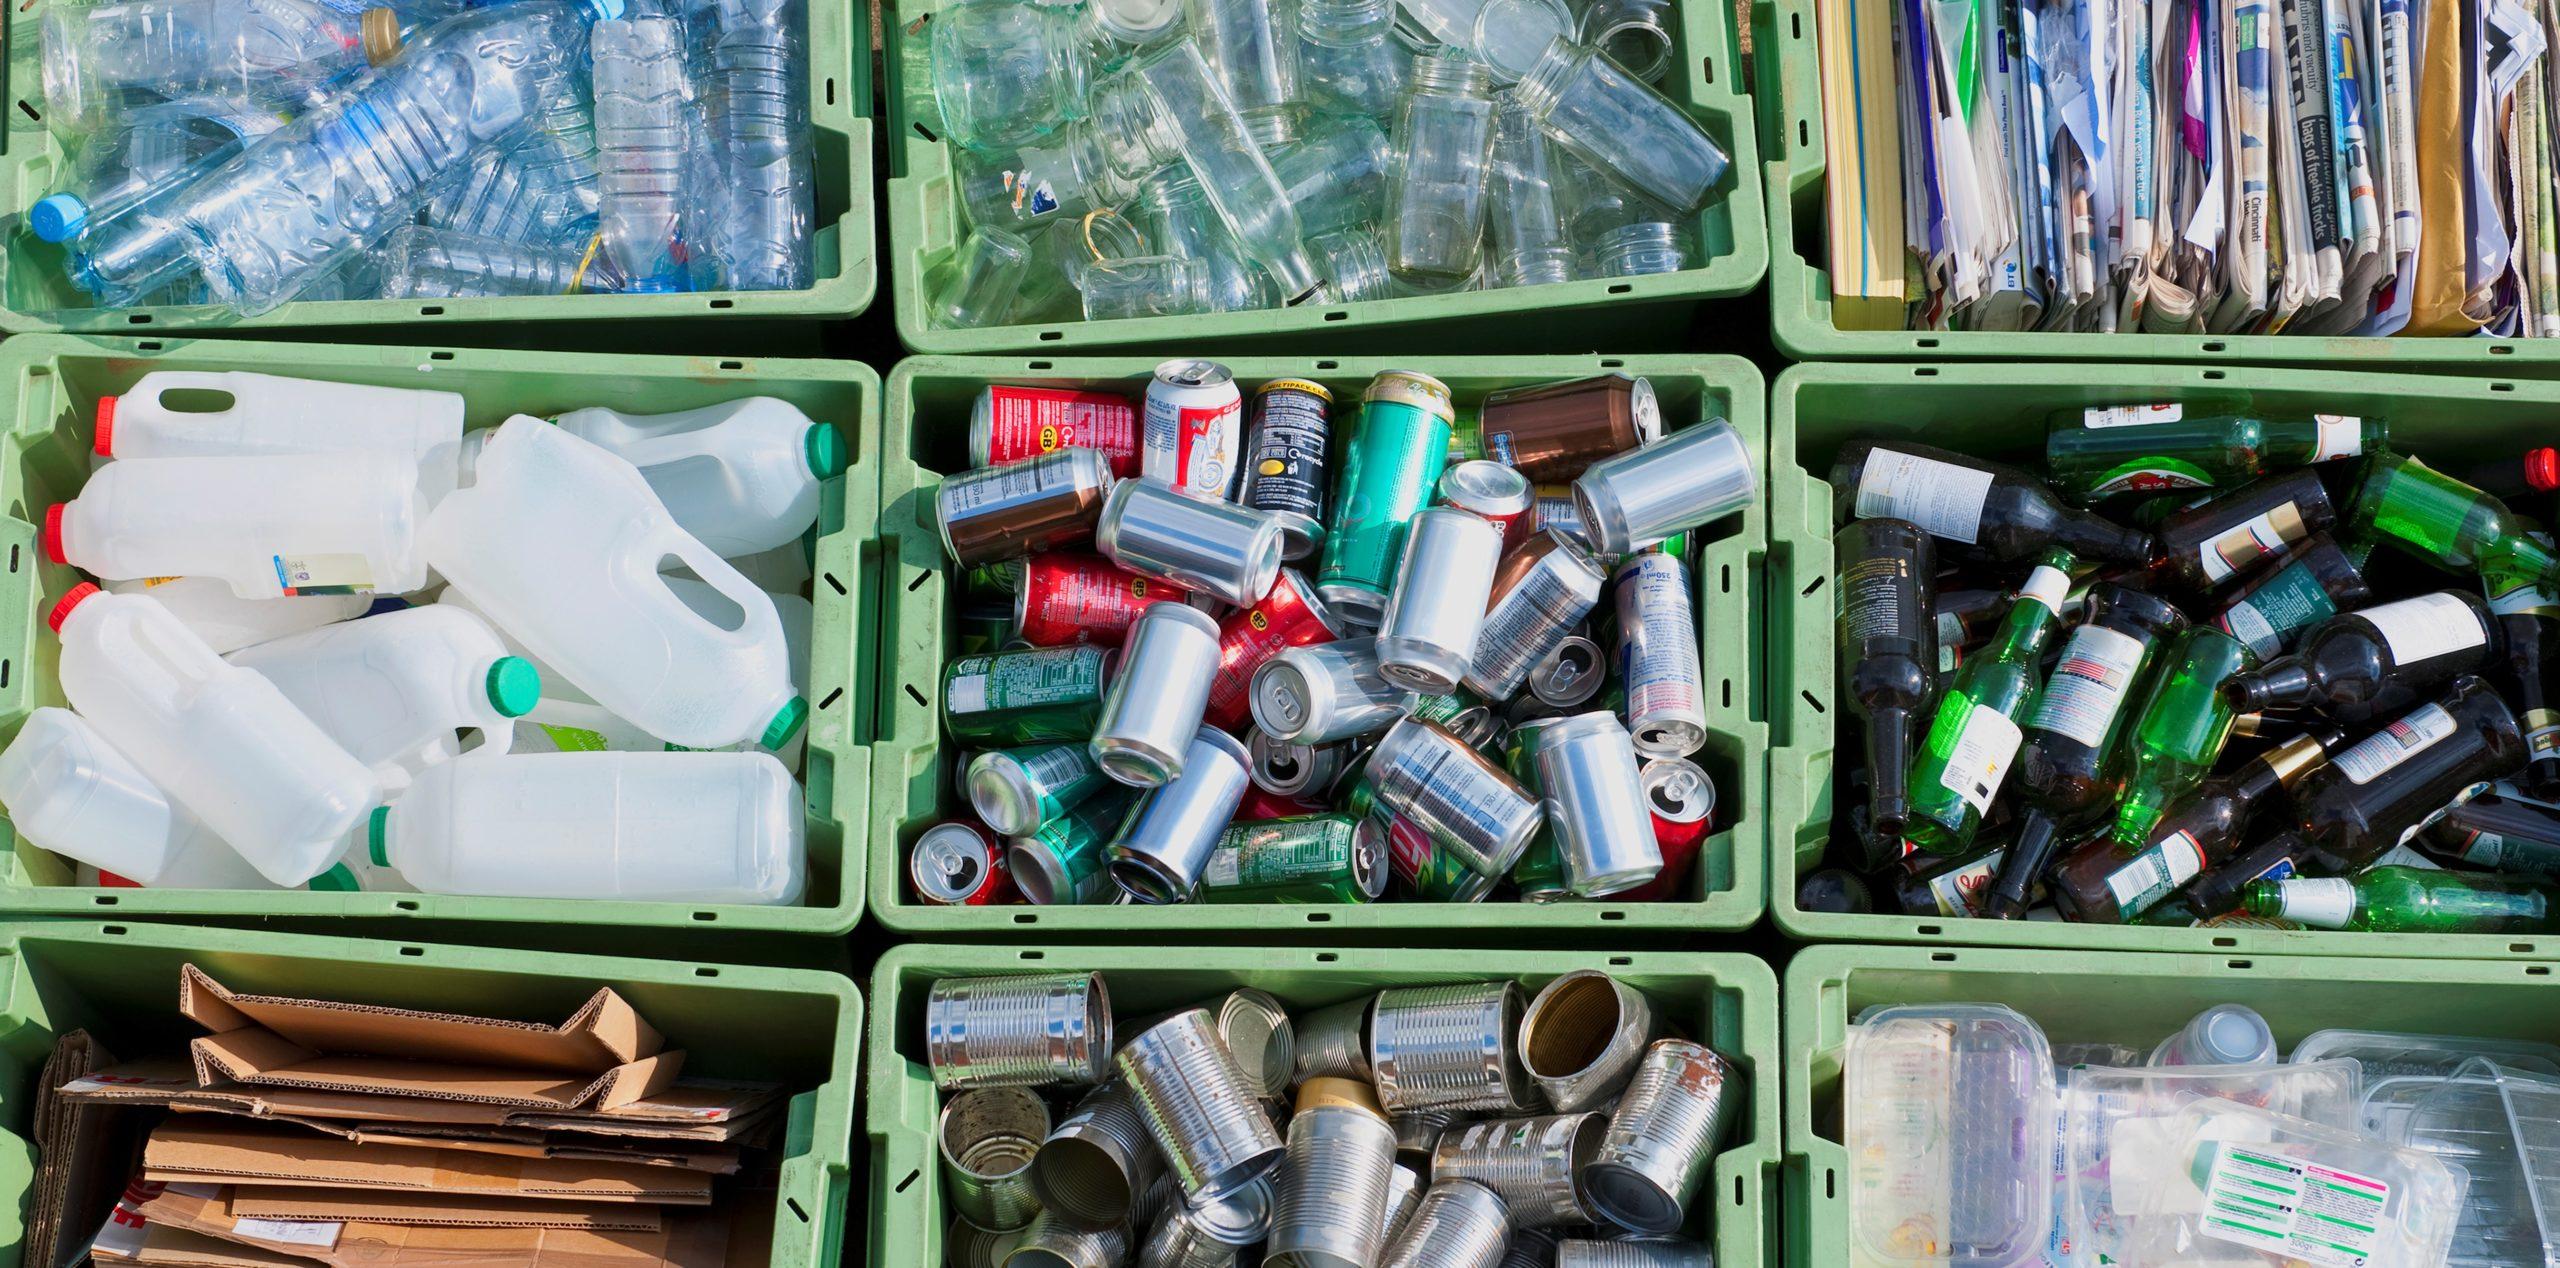 COVID-19: A waste management roadblock